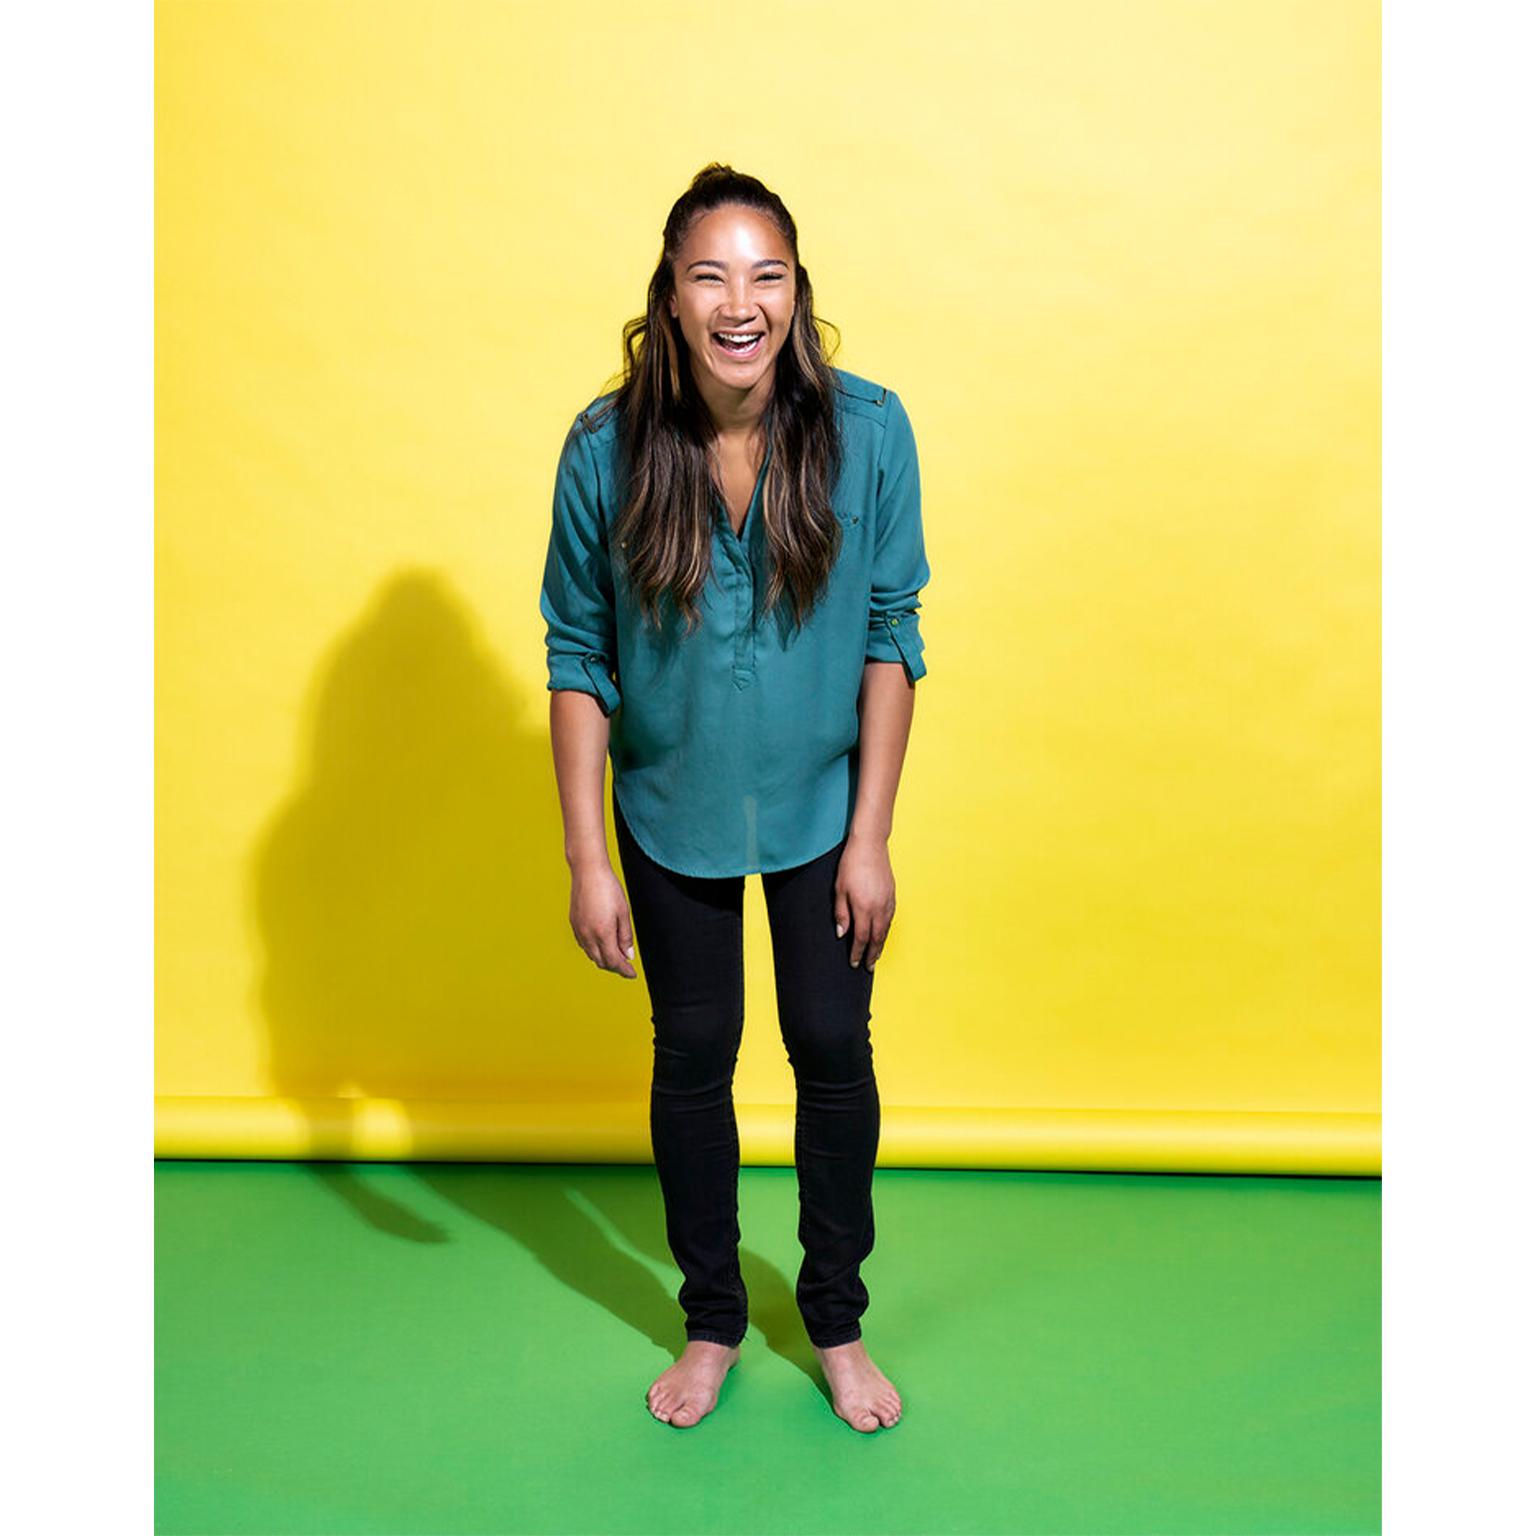 Toronto Fitness Model Agency - Lifestyle Commercial Model - Alysia Thomasos 3